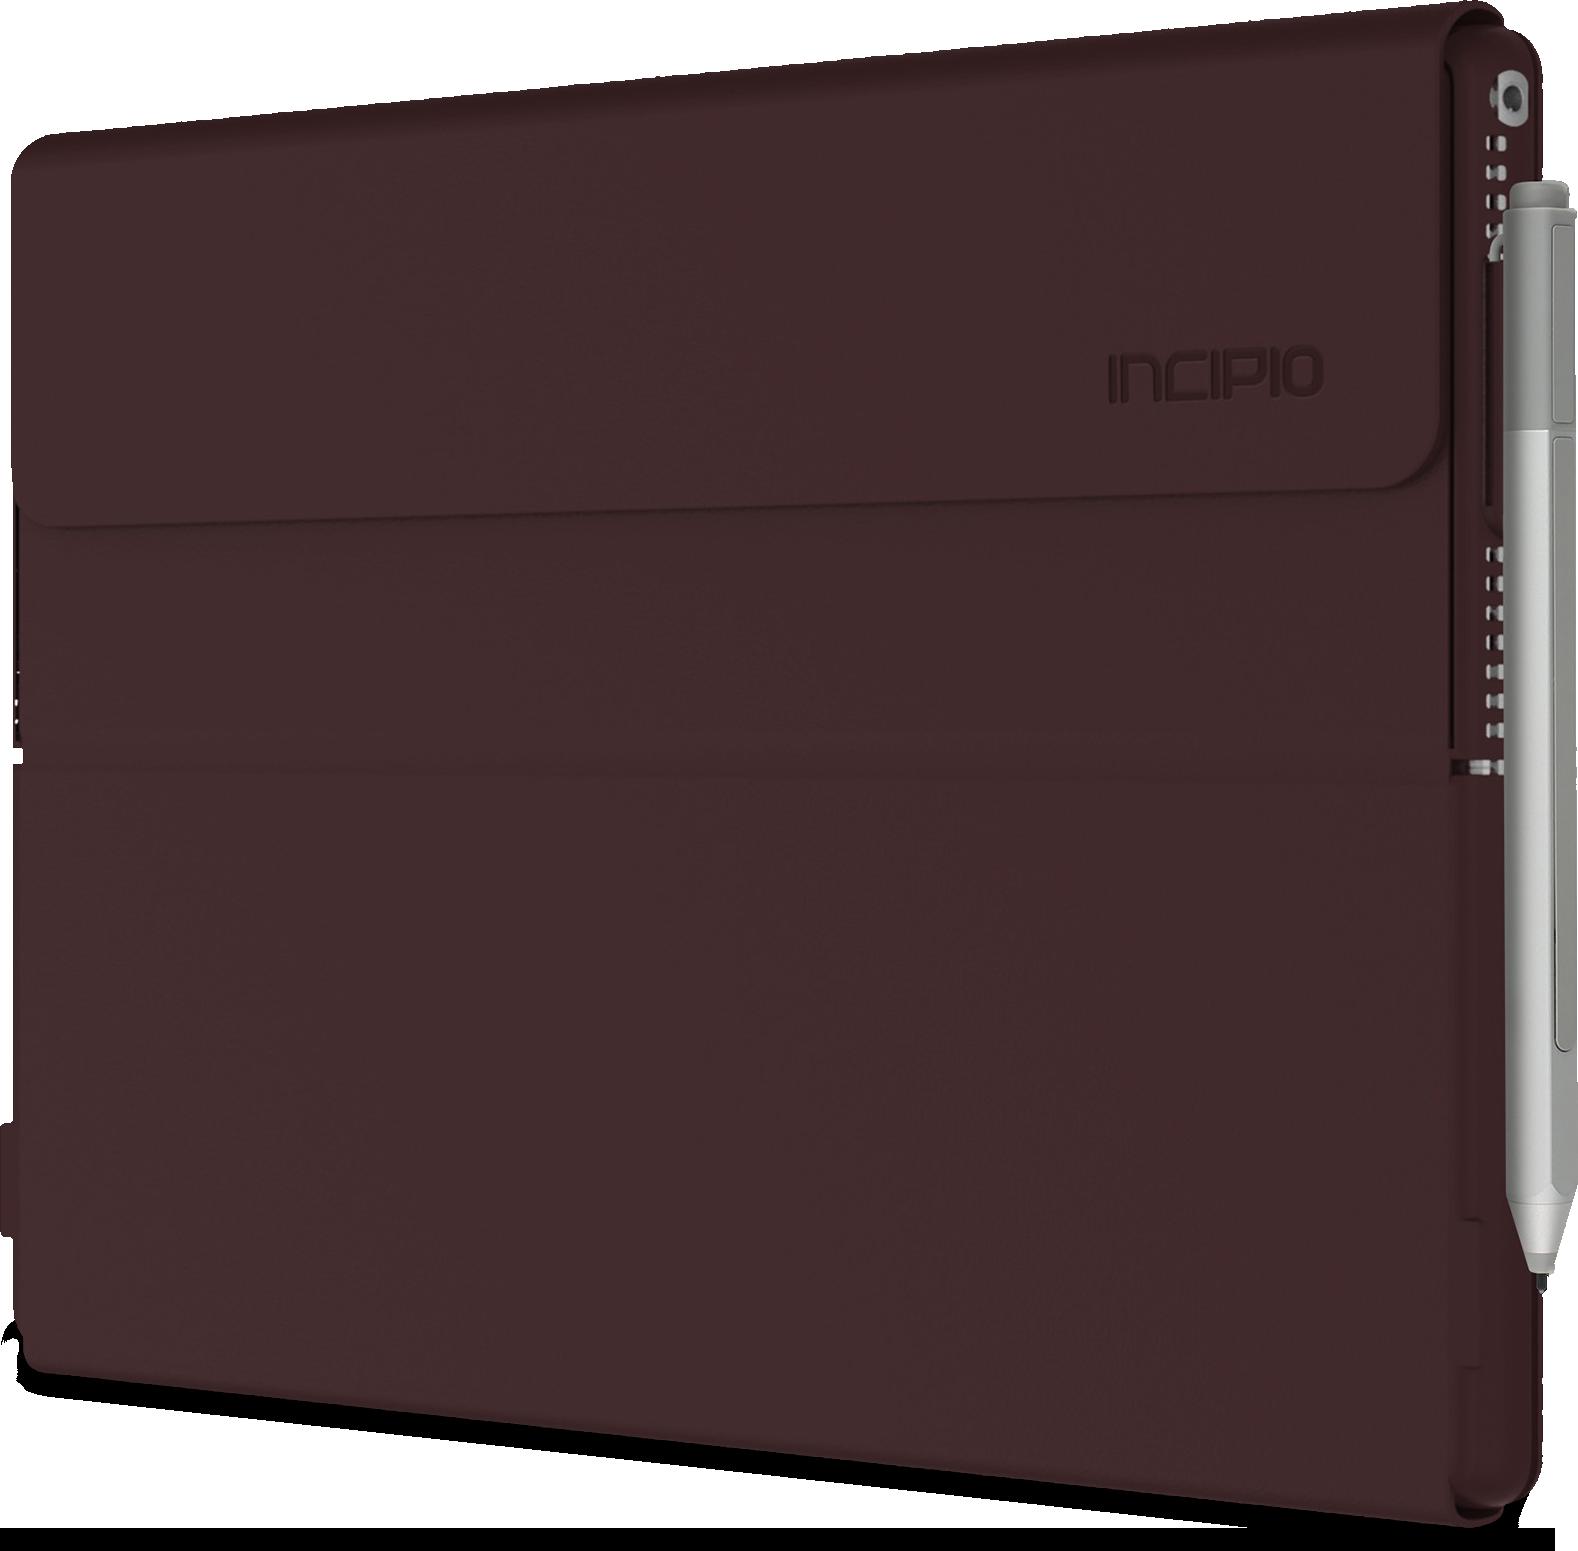 Dopasowane etui Incipio Faraday na tablet Surface Pro (burgund)